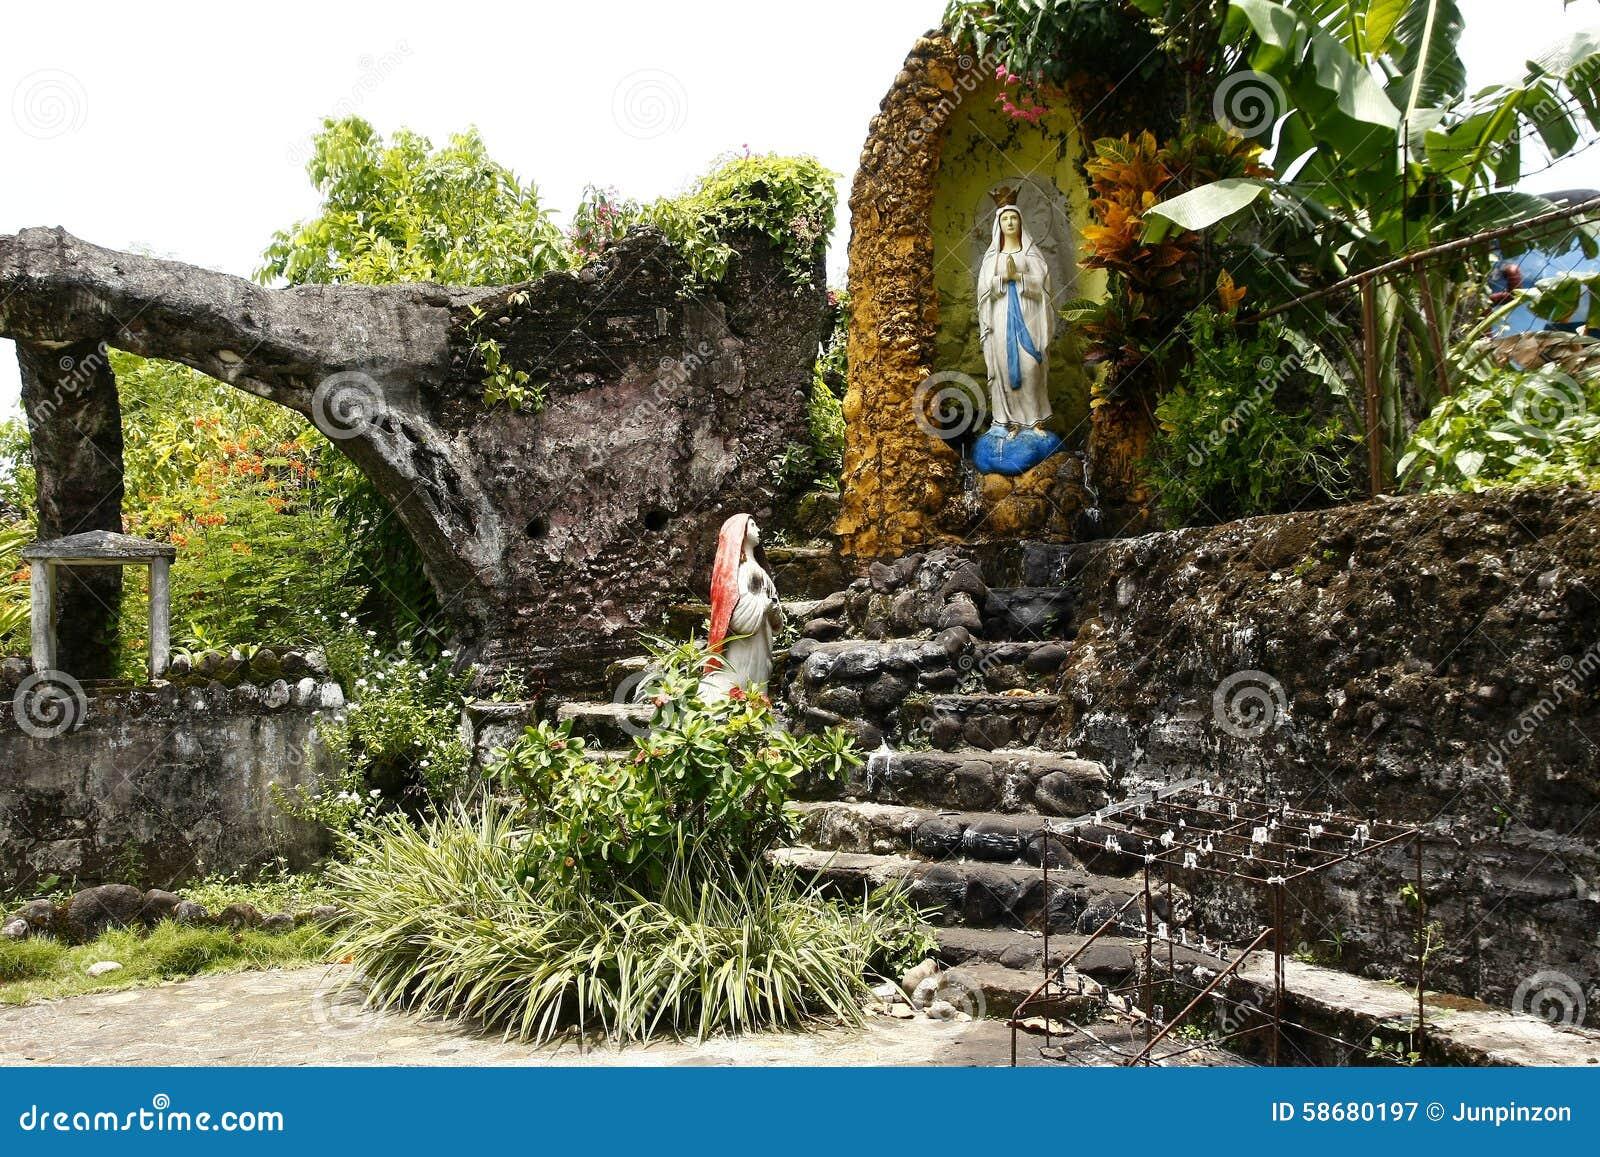 Religious Grotto Designs wwwgalleryhipcom The